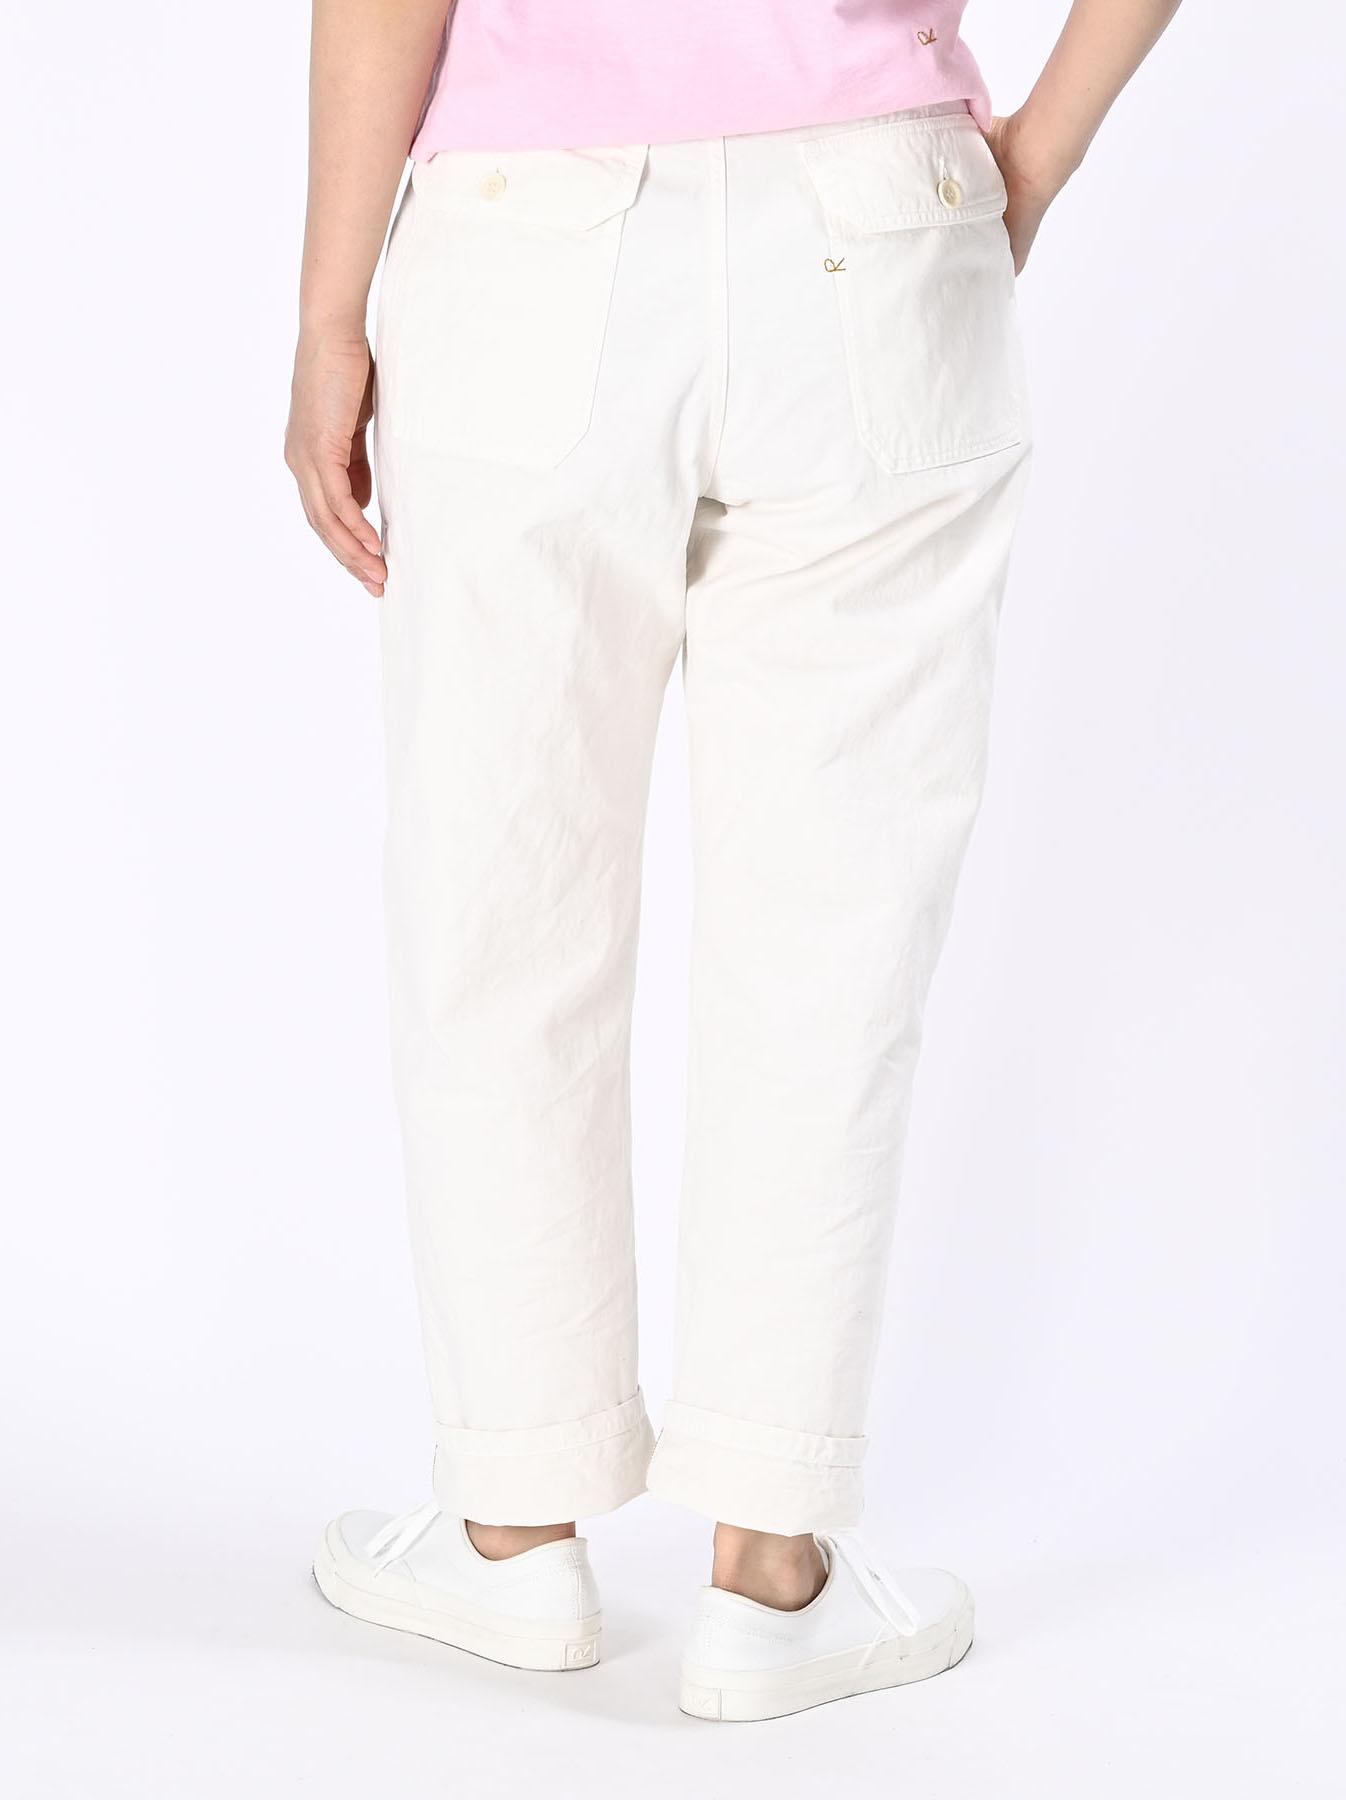 Yacht Cotton White 908 Baker Pants (0521)-7